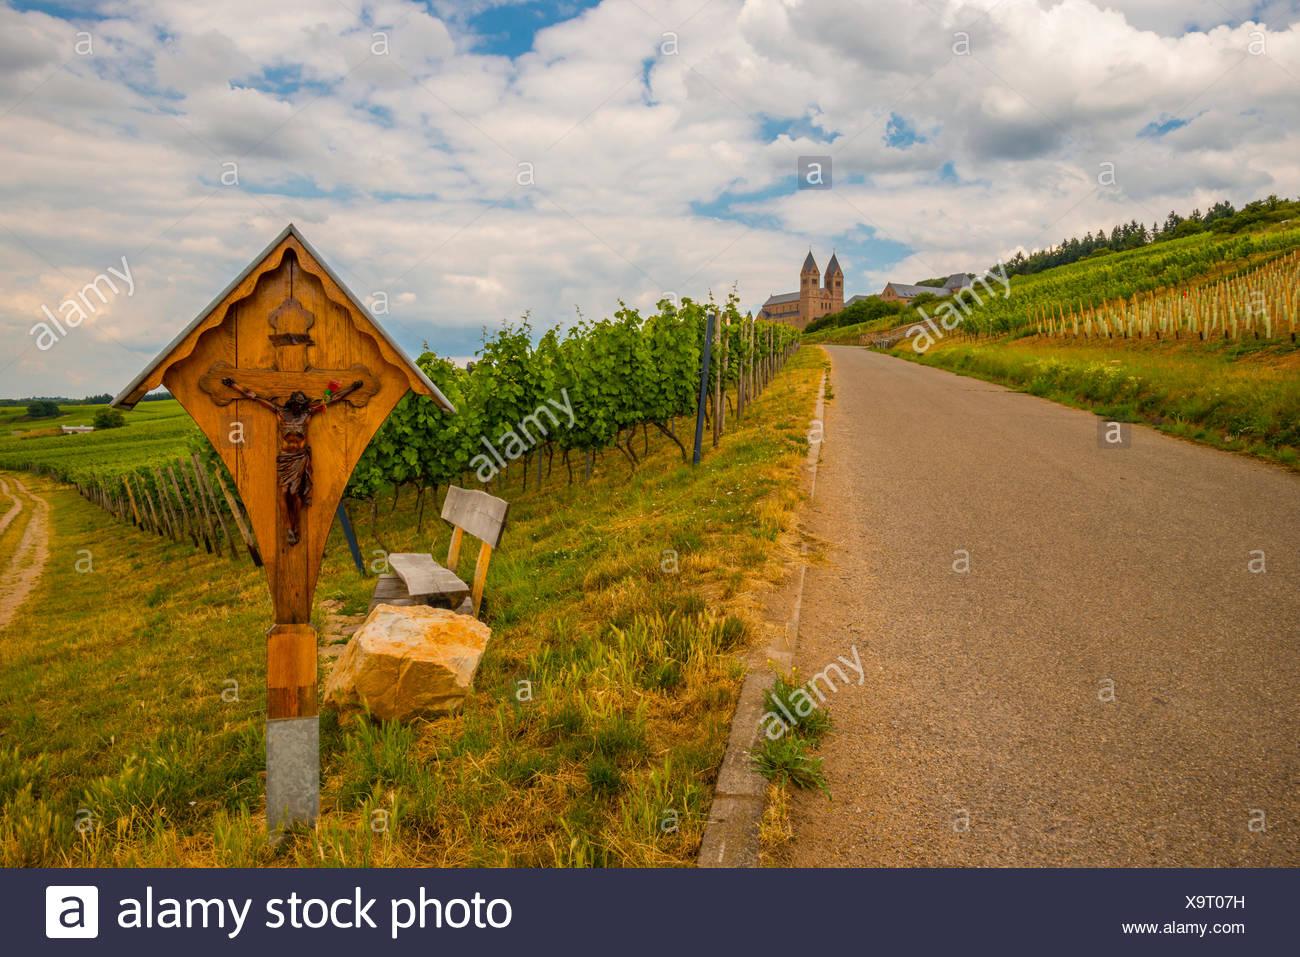 Abbey, Benedictine, Bingen, diocese, bishopric, Germany, Eibingen, Europe, Hessen, Hildegard, Limburg, Rüdesheim Stock Photo